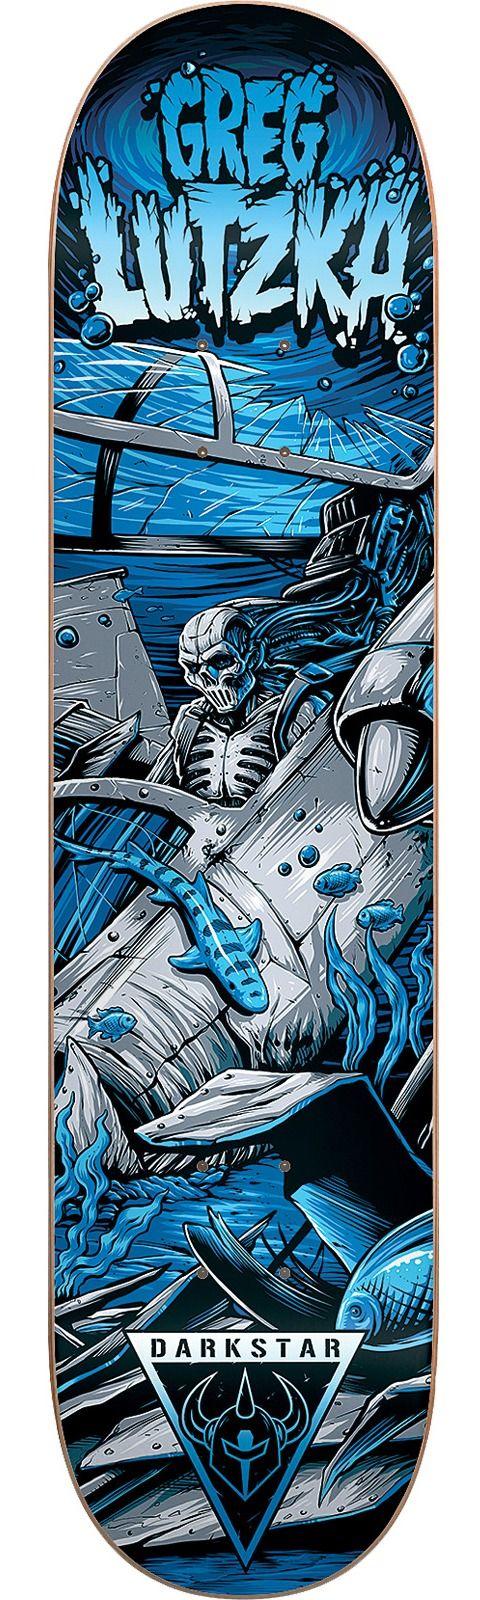 Darkstar Greg Lutzka Resin 7 Crash Skateboard Deck